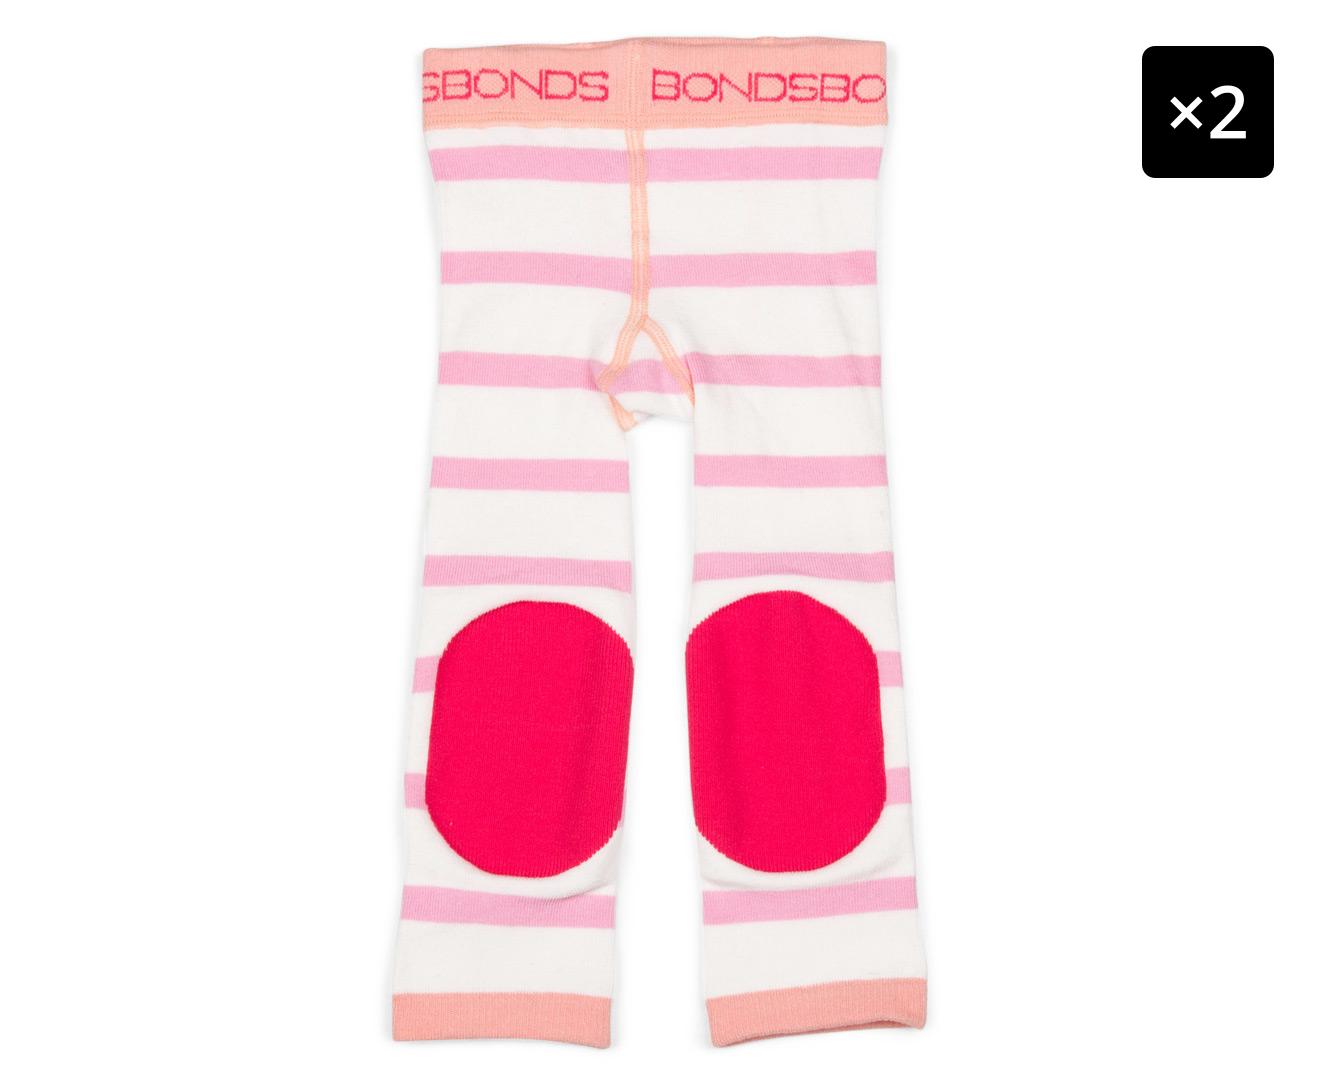 e56669b41 2 x Bonds Baby Size 6-18 Months Crawler Legging - Paddle Pop Pink |  Catch.com.au